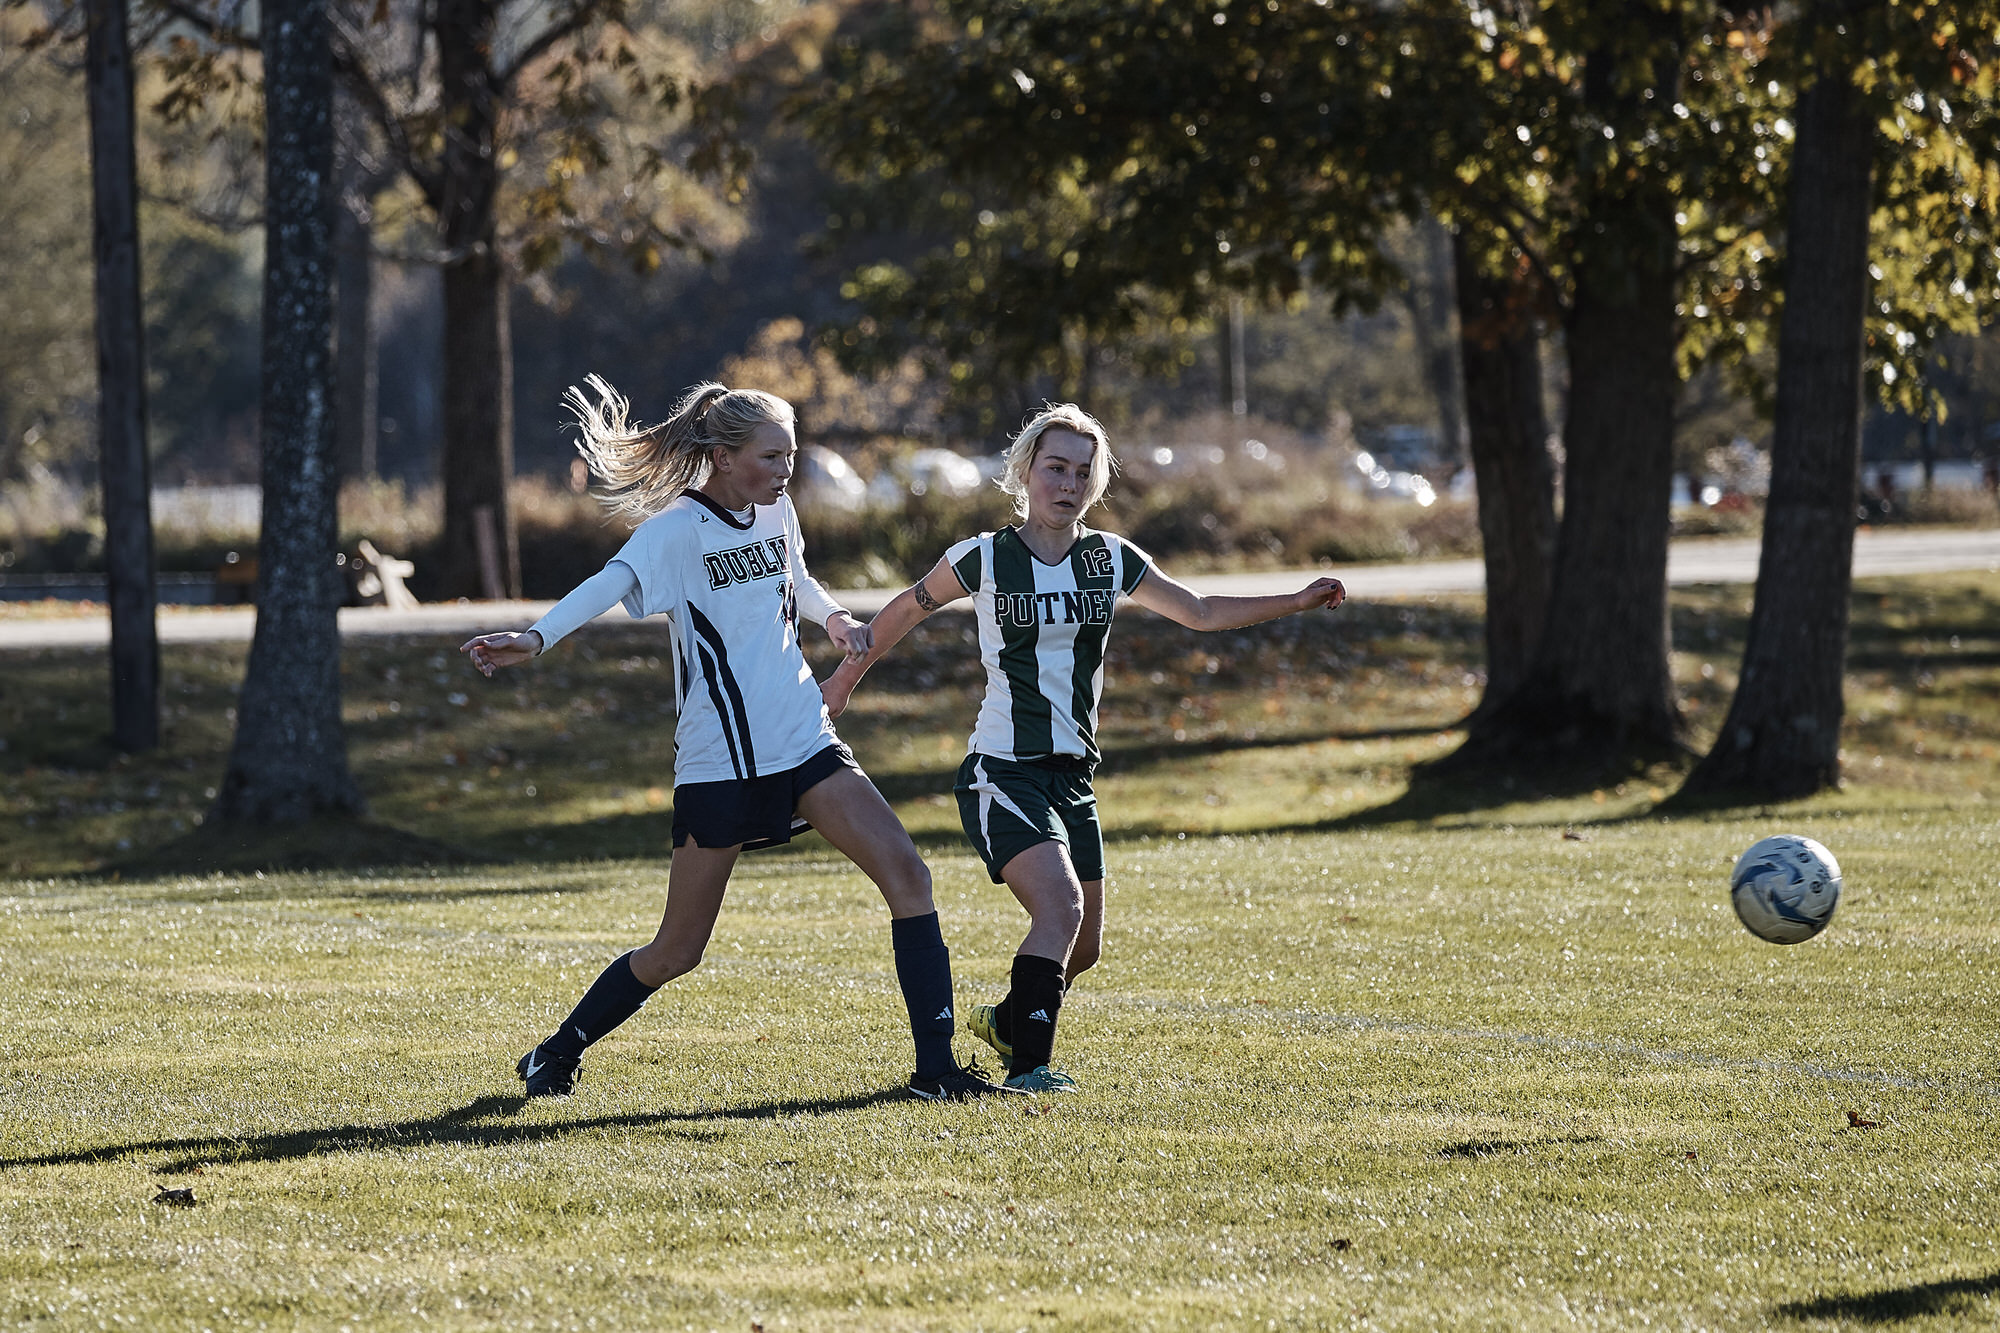 Girls Varsity Soccer vs. Putney School - October 26, 2018 - 020.jpg